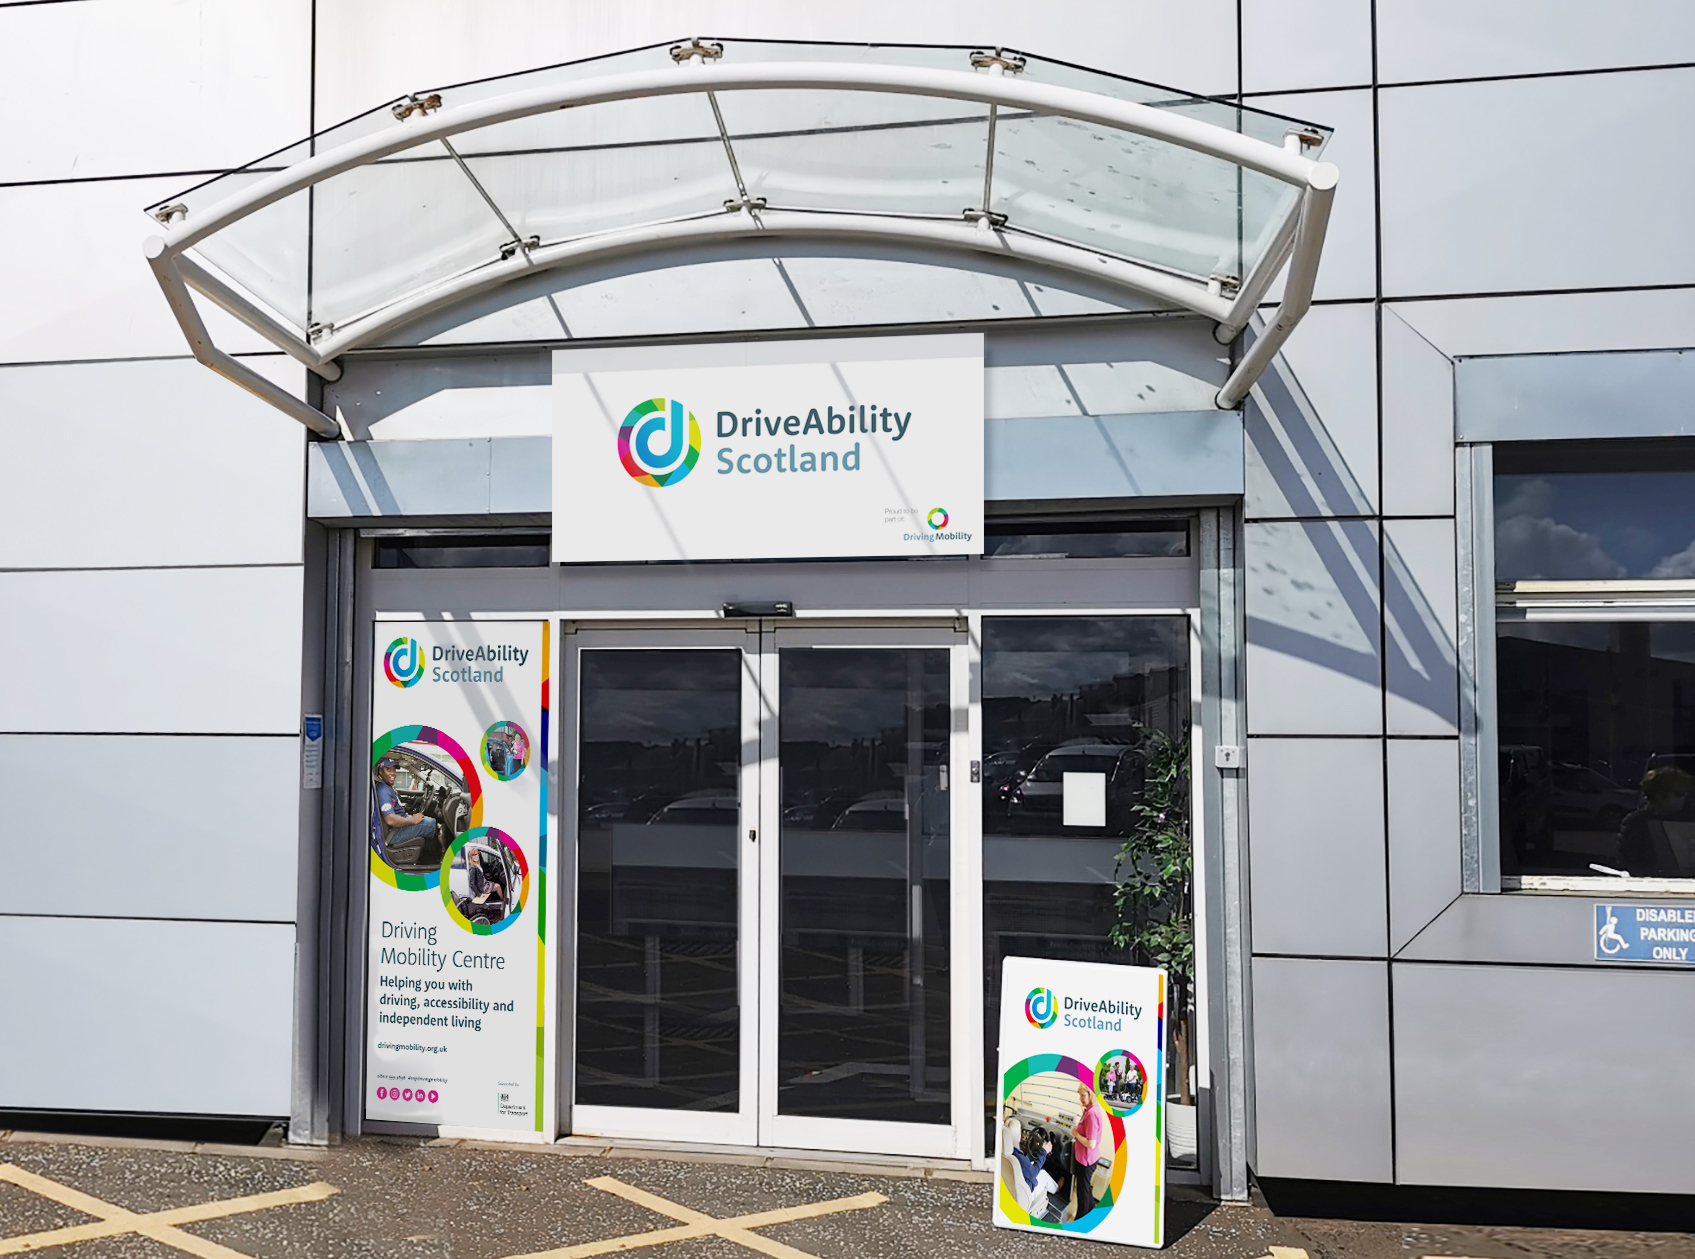 DriveAbility Scotland